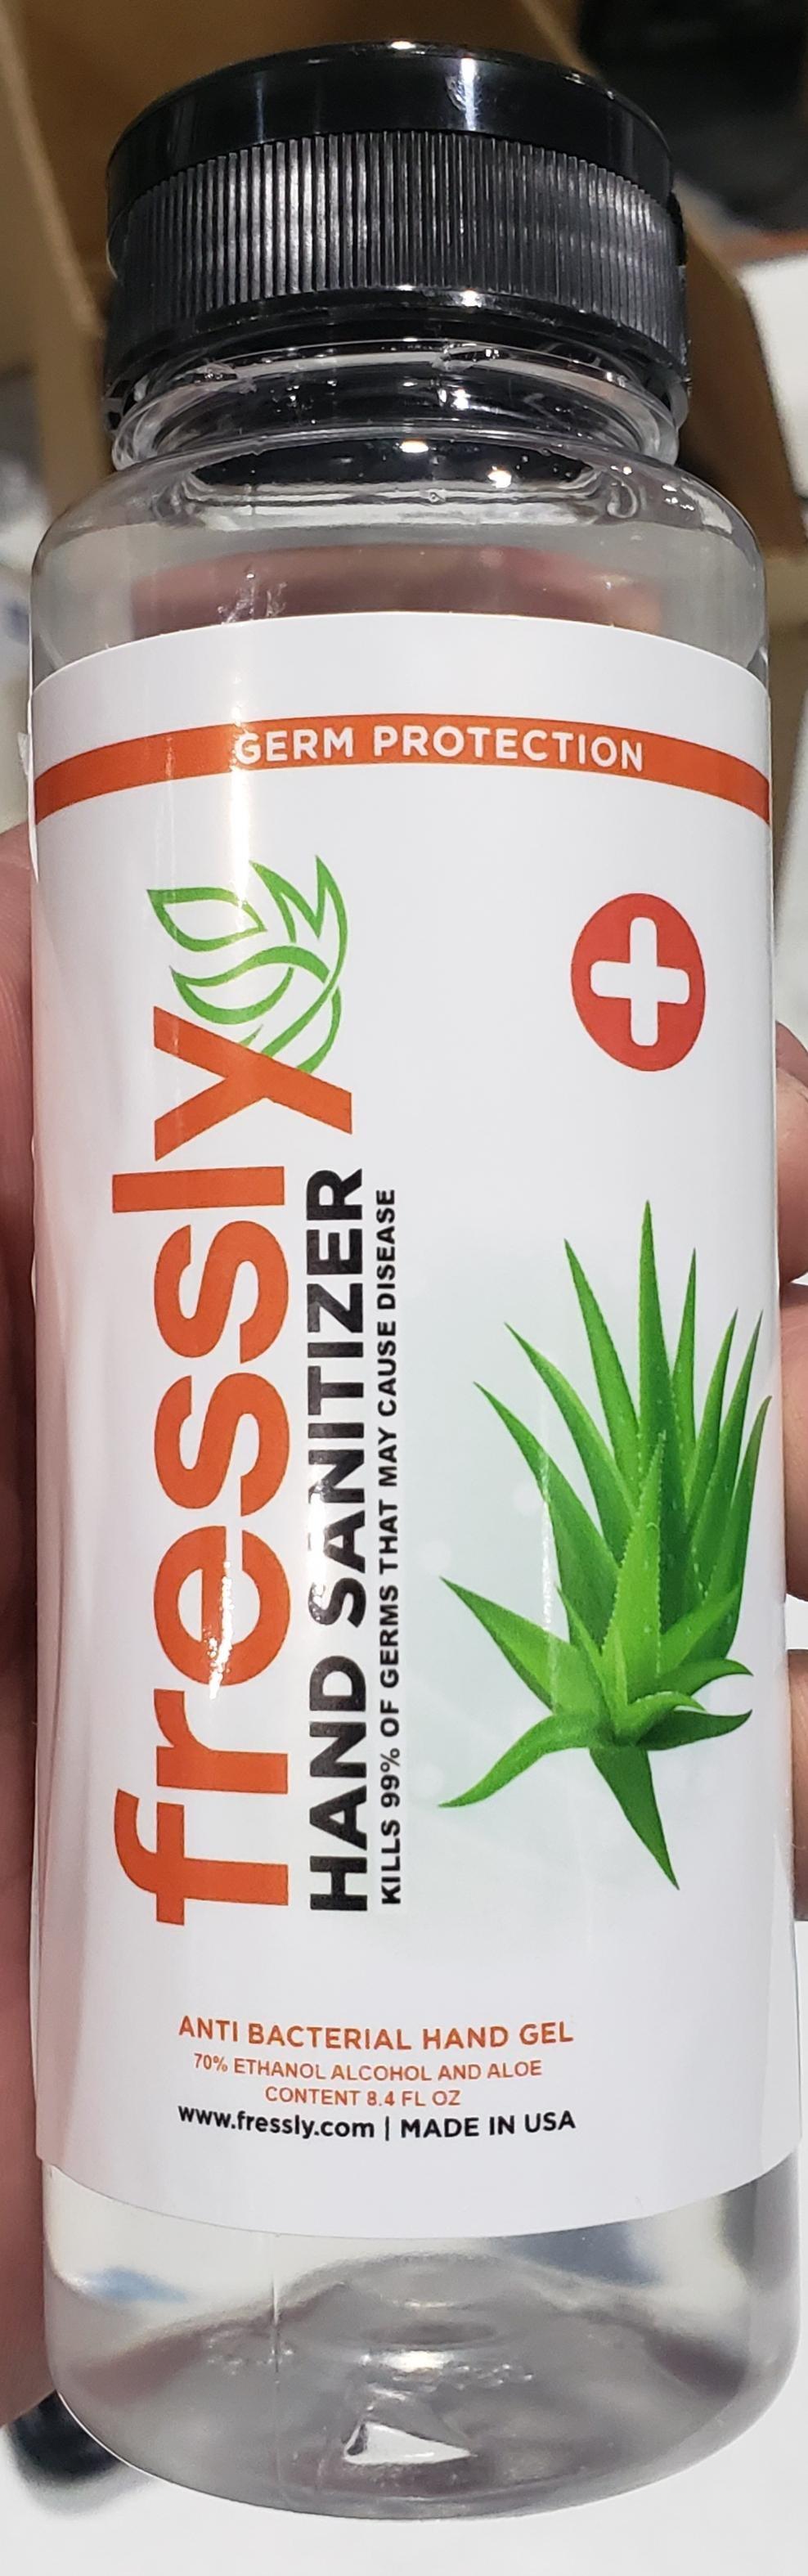 Fressly bottle image